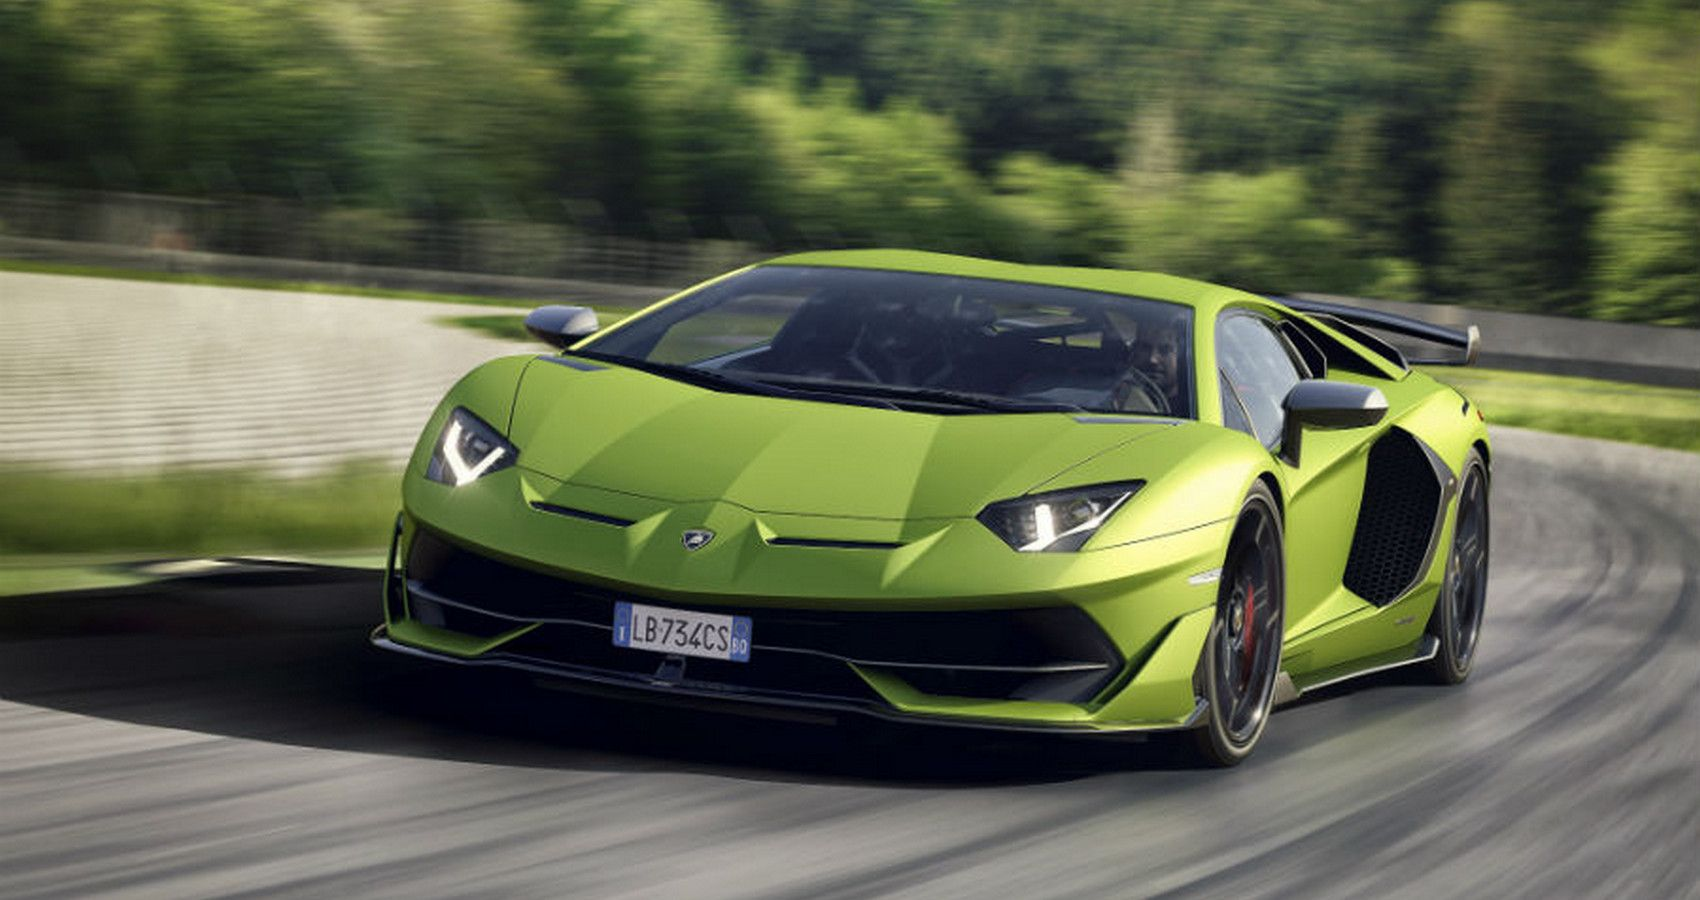 Here's What Makes The Lamborghini Aventador SVJ So Awesome